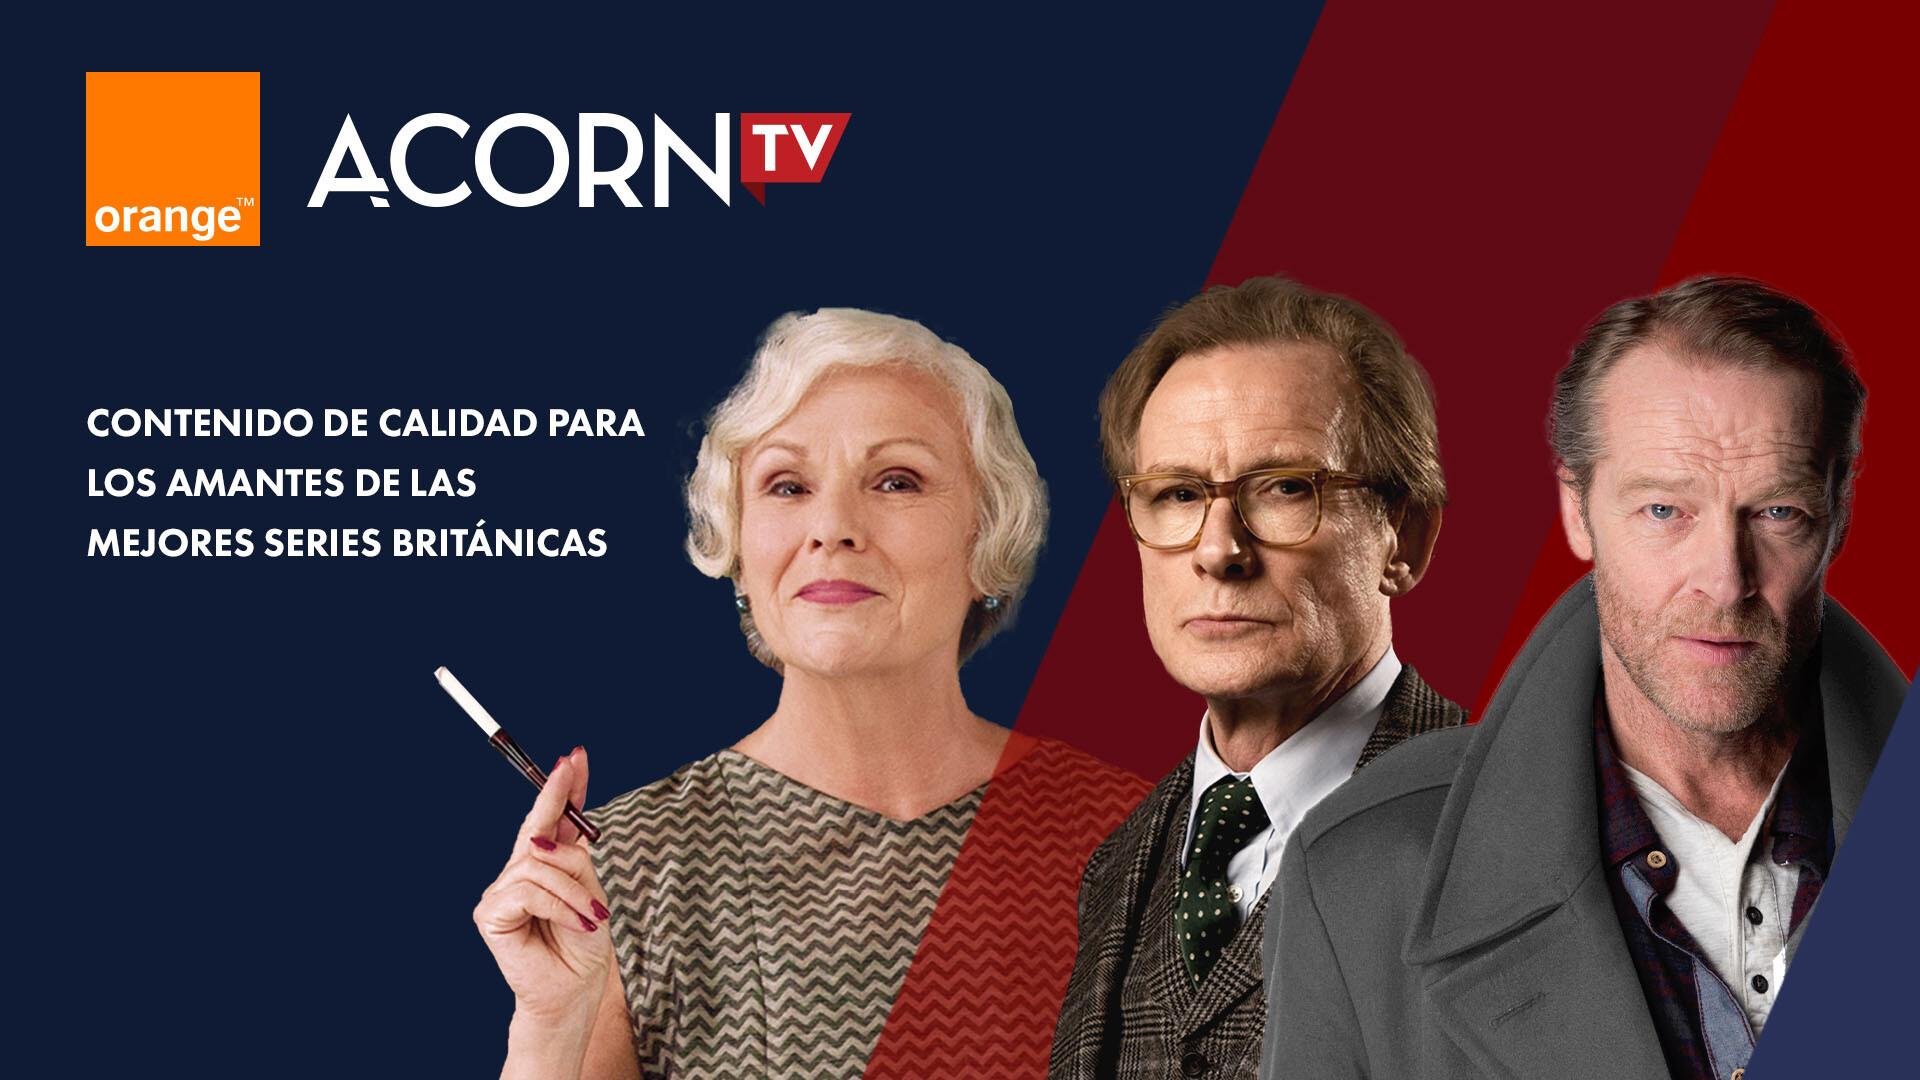 Acorn tv en Orange